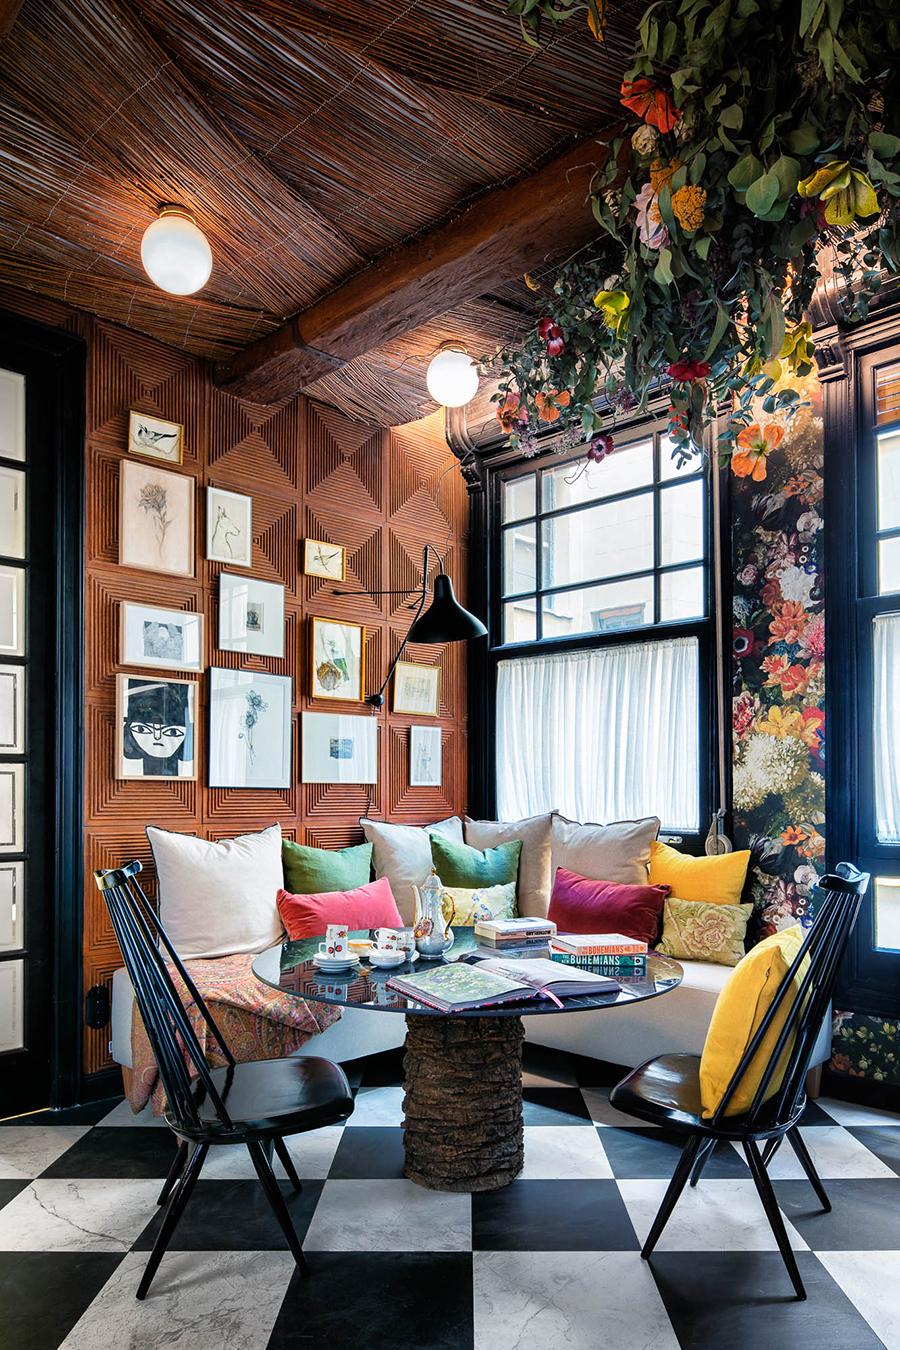 comedor con sofá más butacas con cojines coloridos. Techo floral e iluminación decorativa